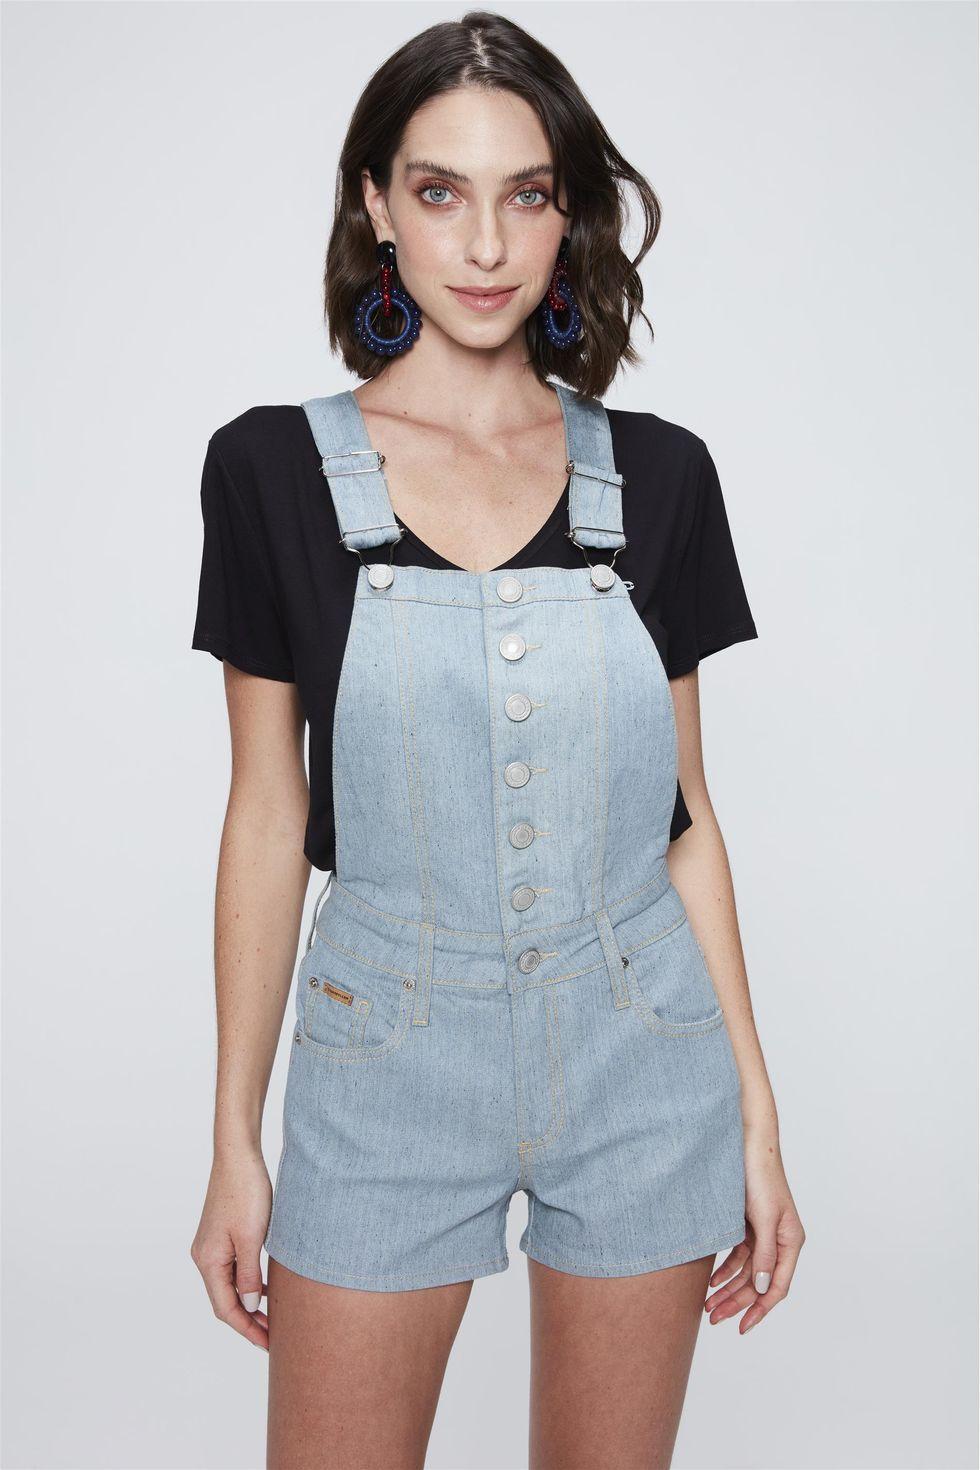 Jardineira-Jeans-Short-Ecodamyller-Frente--